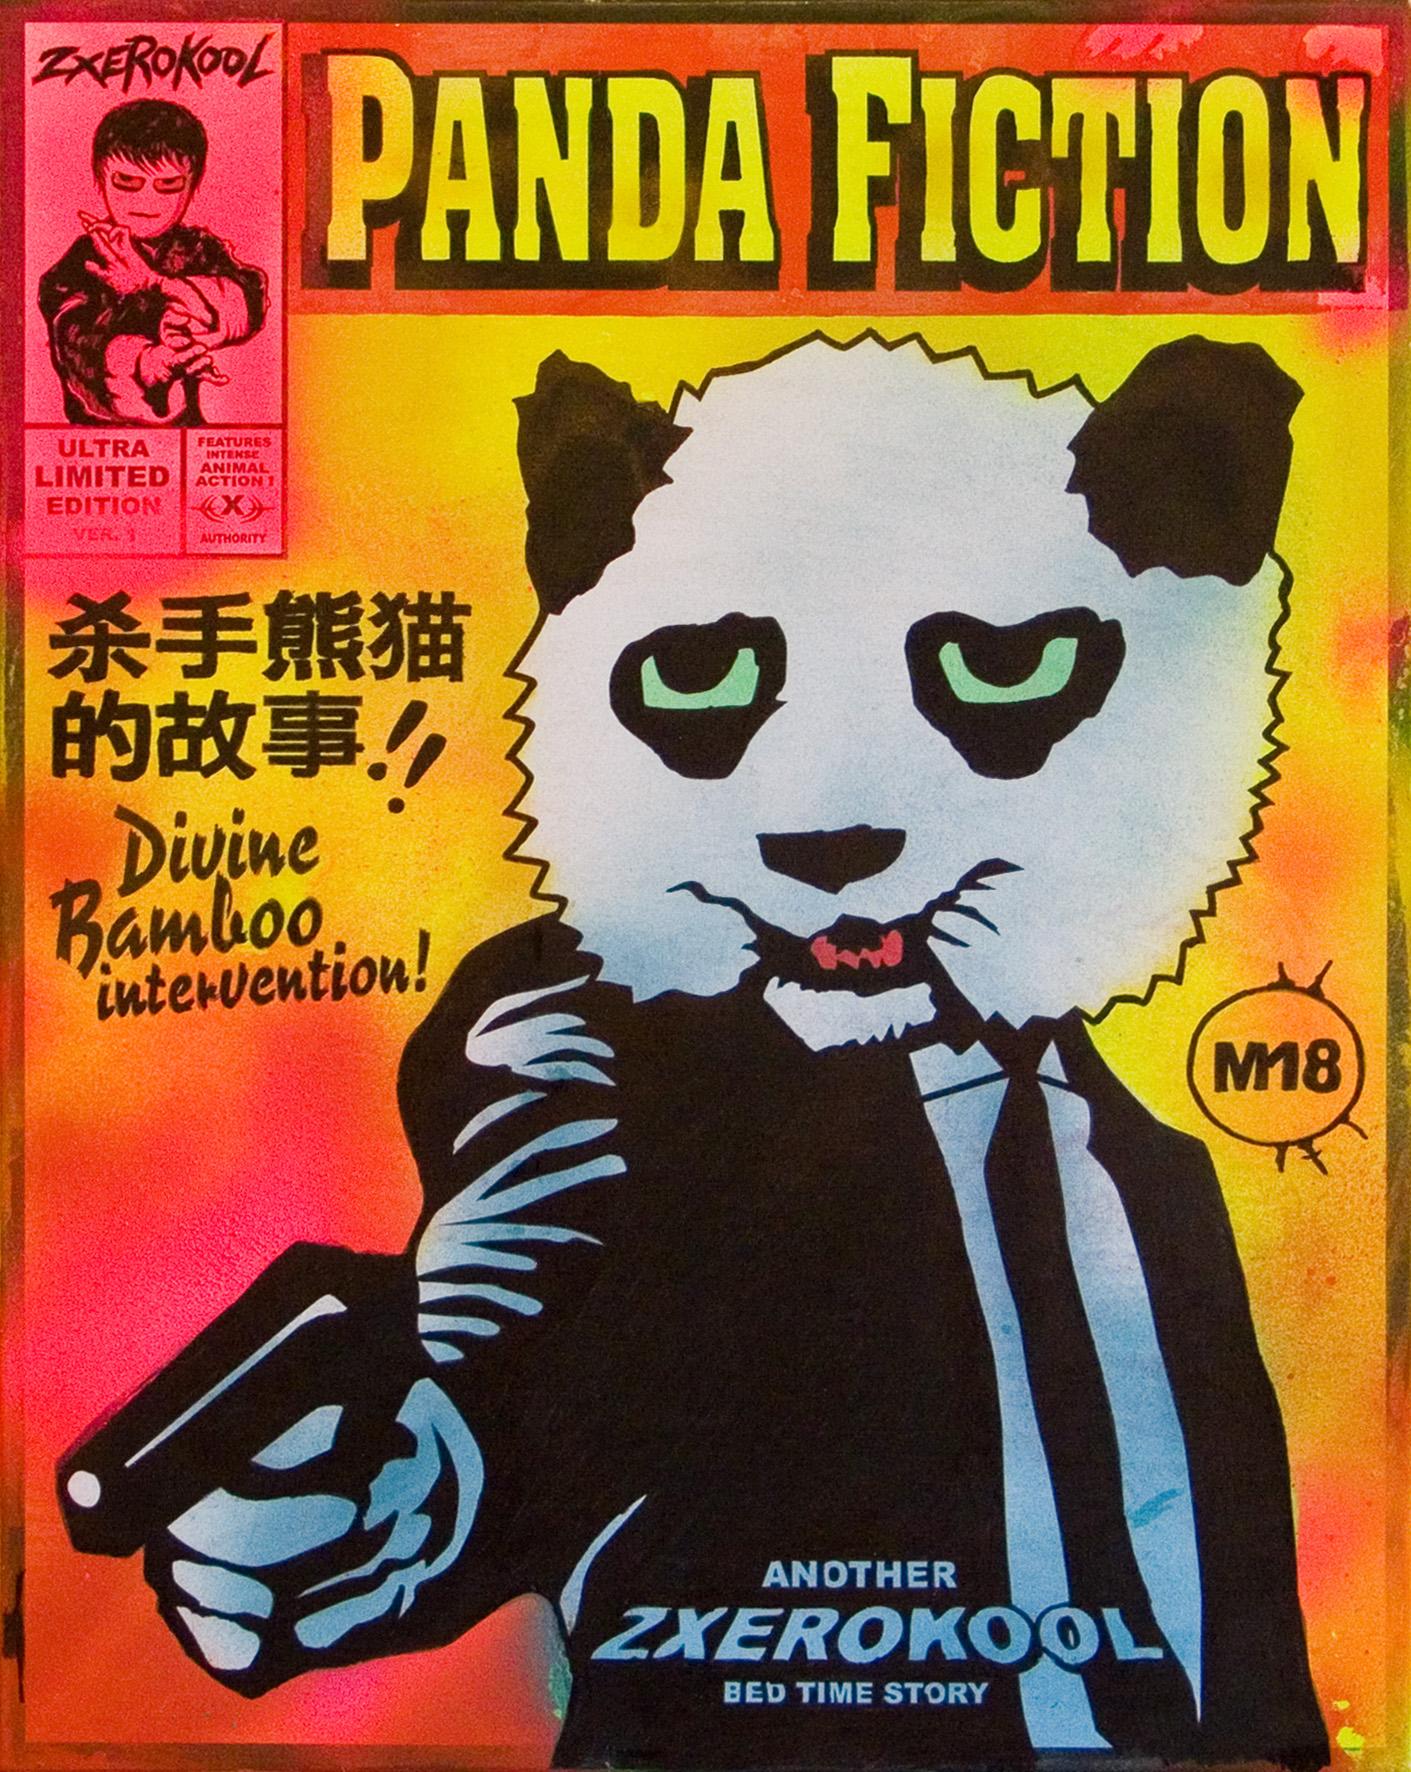 Panda Fiction